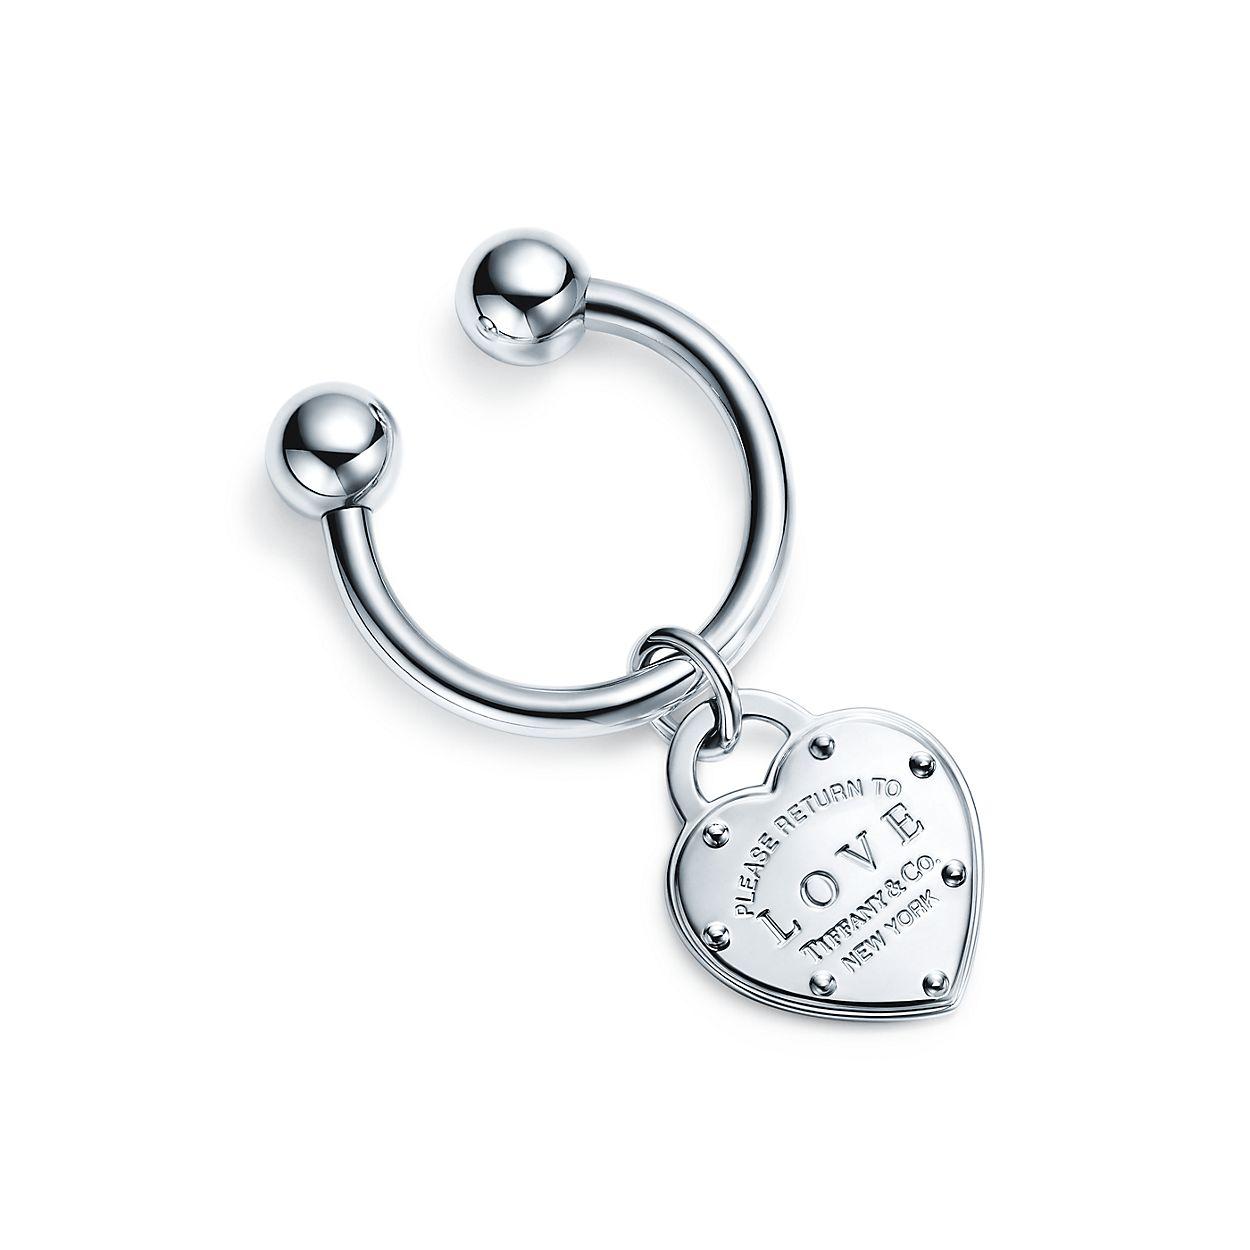 Return to Tiffany Love key ring in sterling silver Tiffany & Co. OVEzu8hXl3